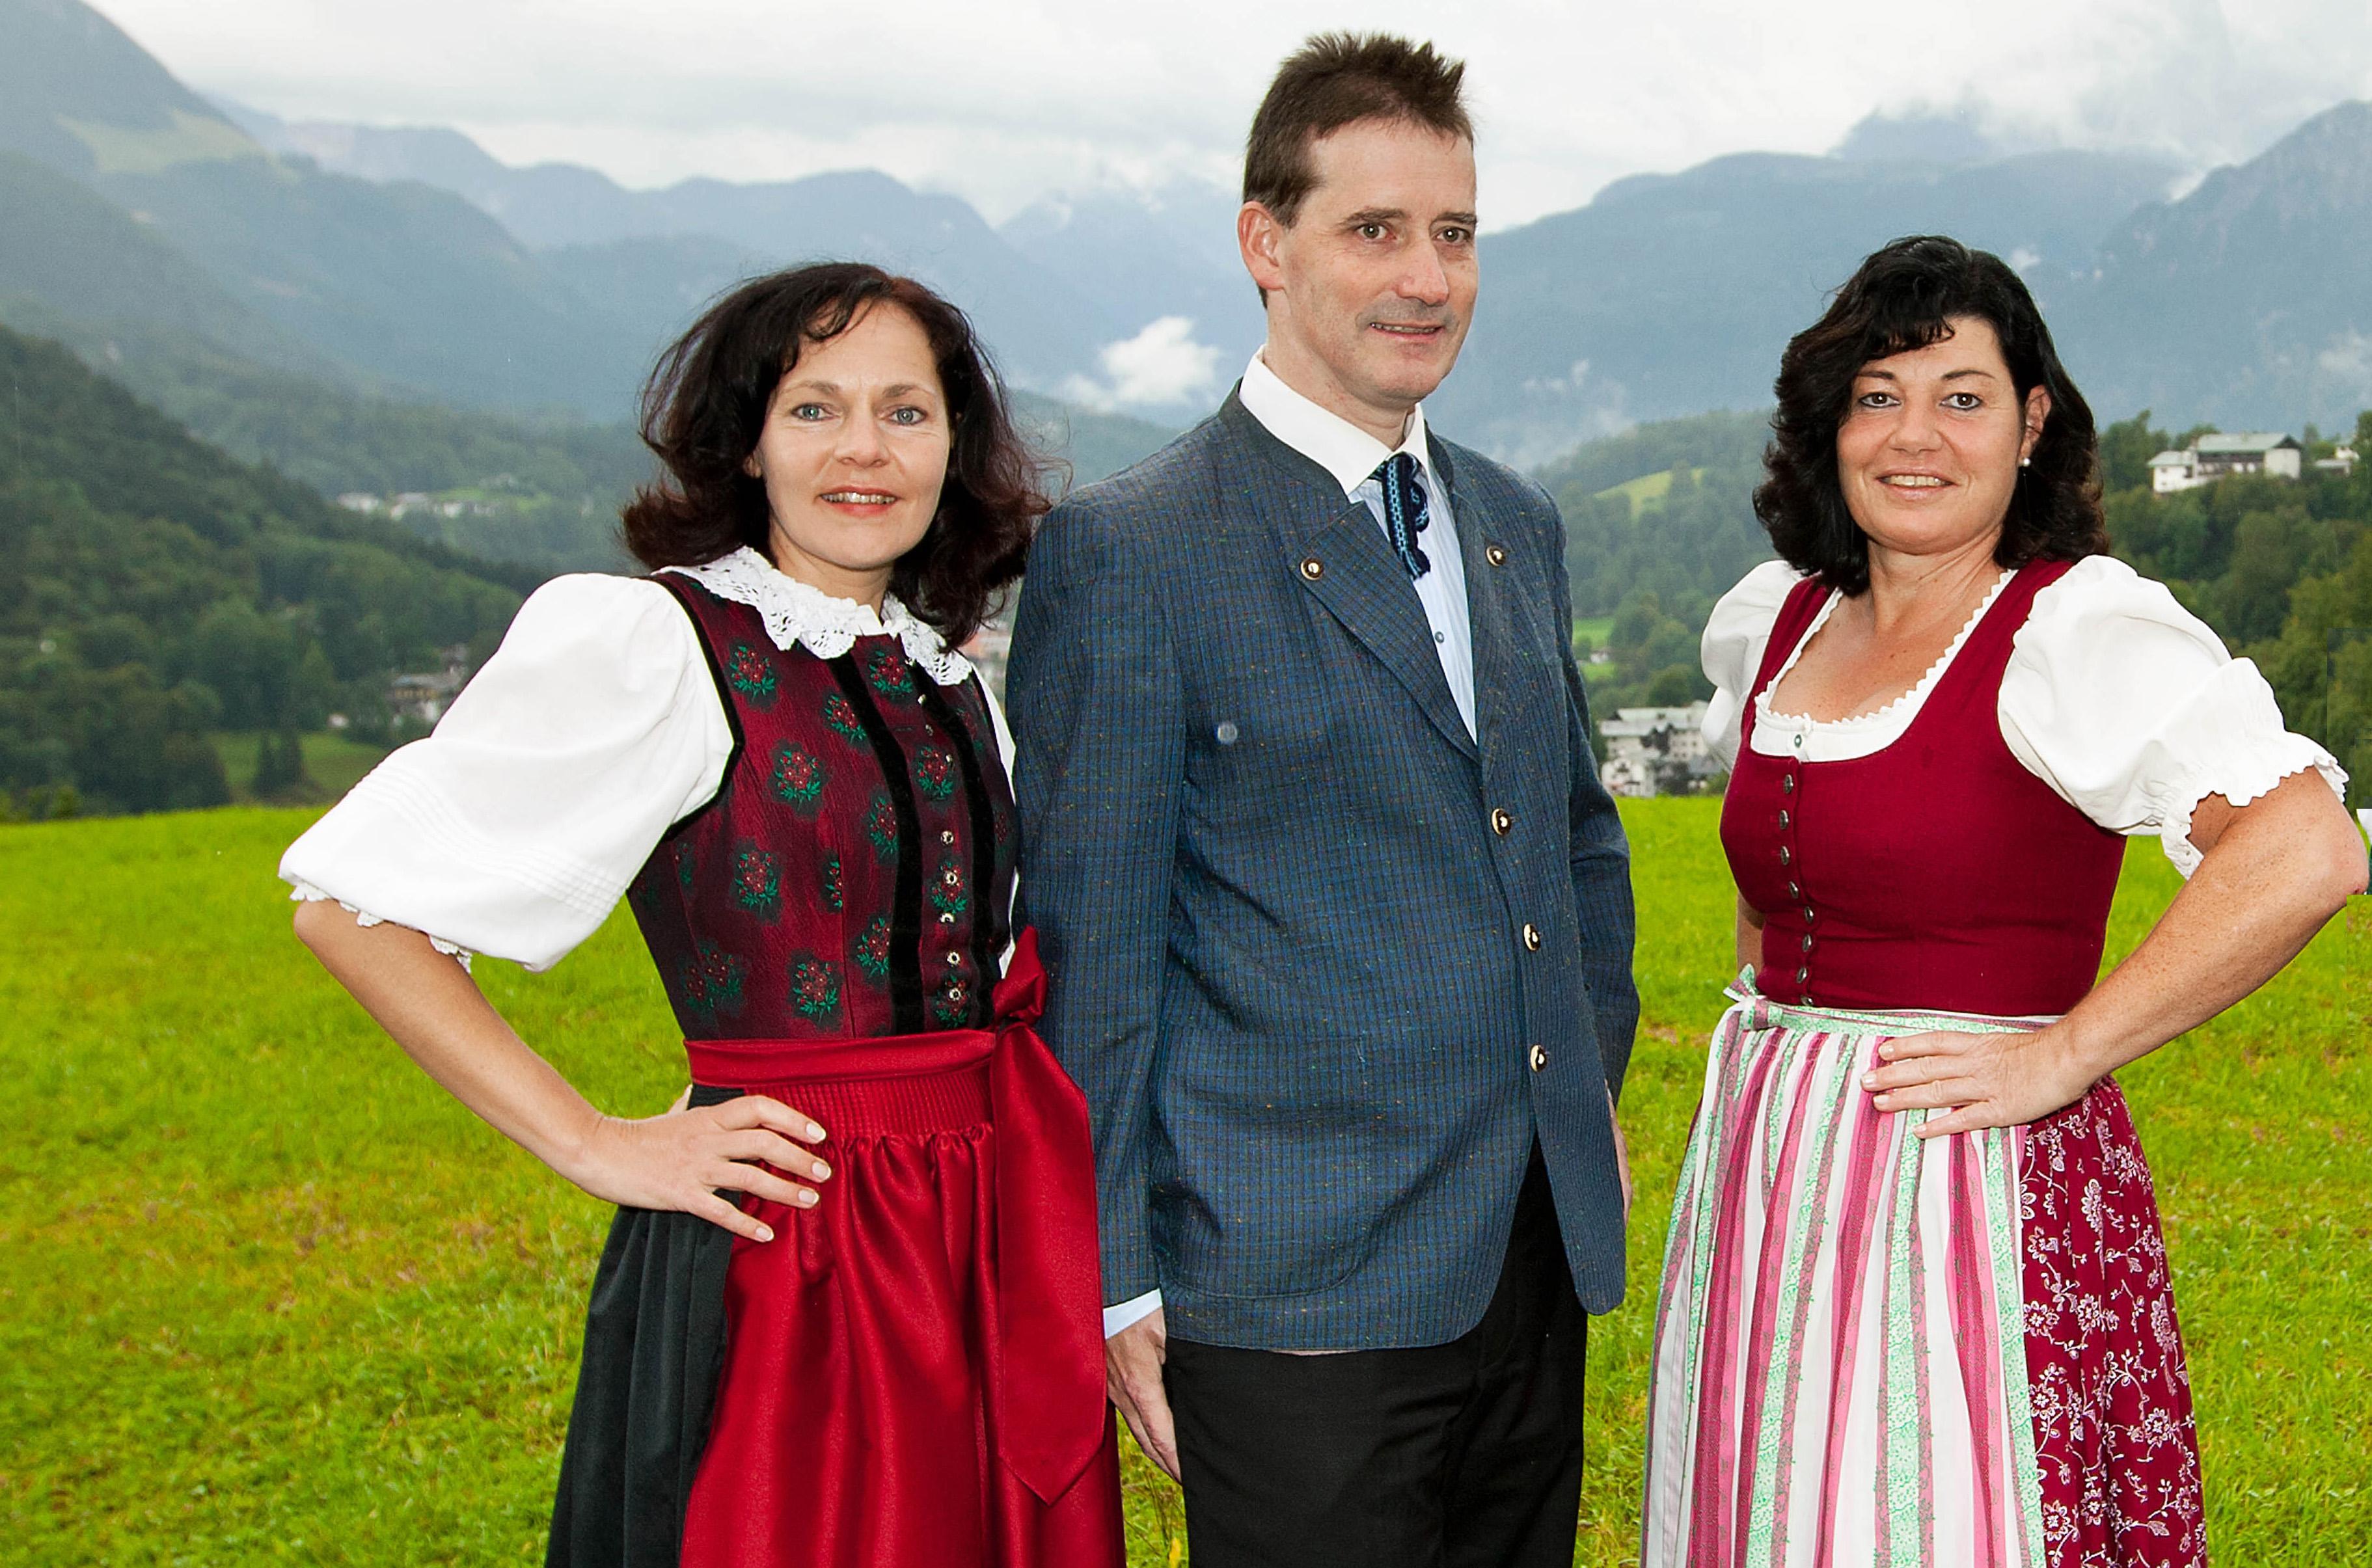 Nowak Immobilien aus Berchtesgaden Immobilienexperte Armin Nowak